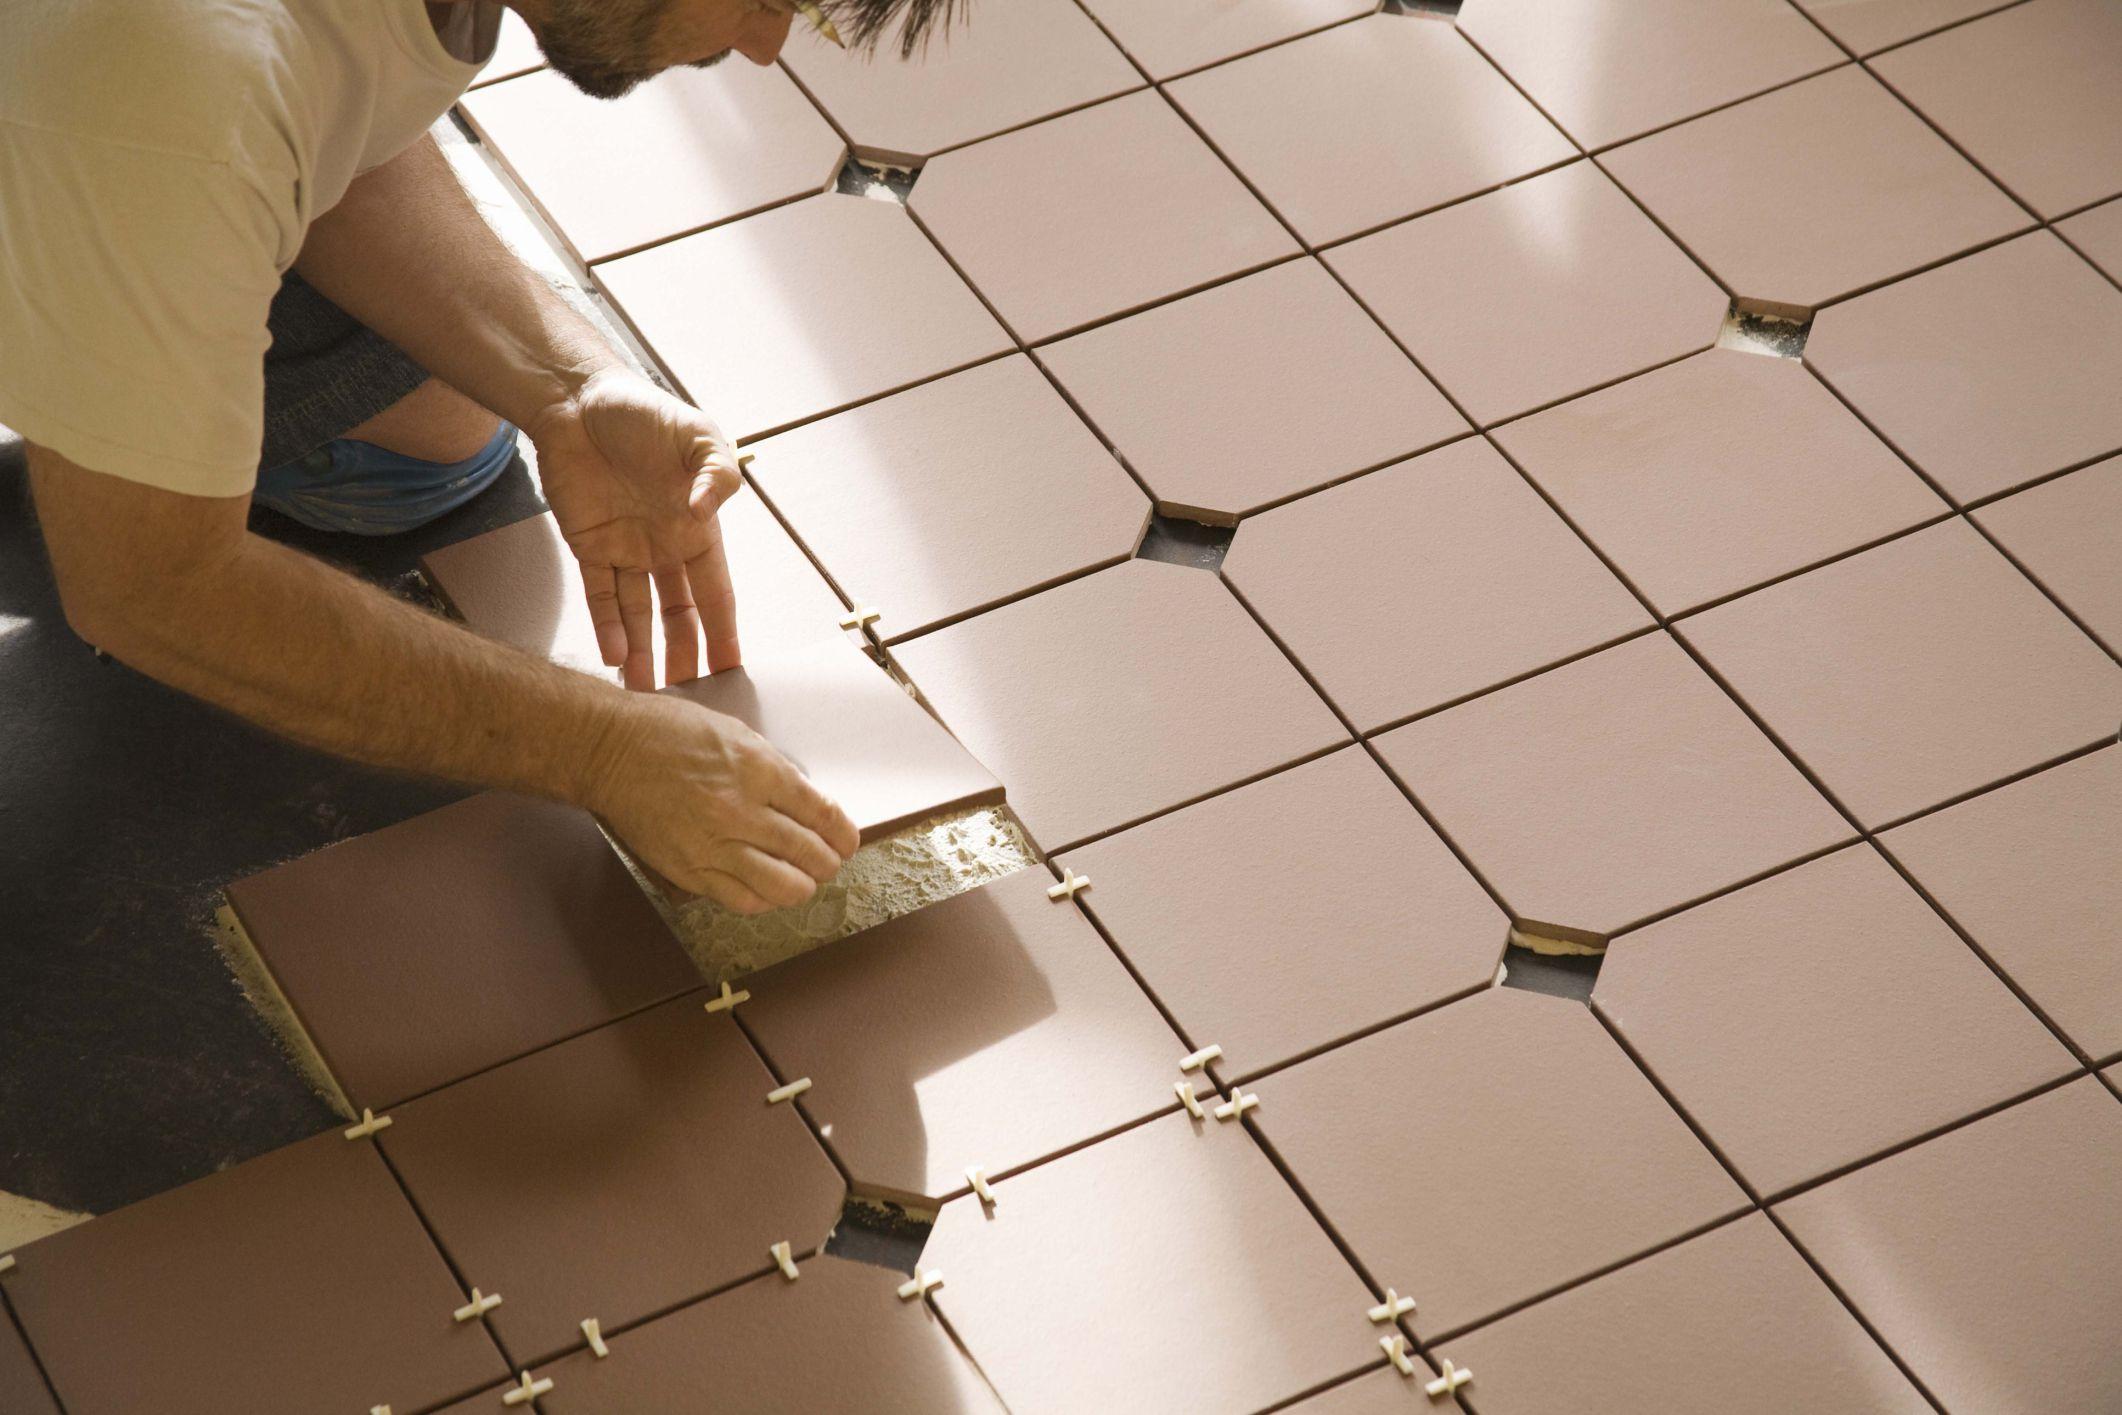 Floating Tile Flooring  Ready For Prime Time